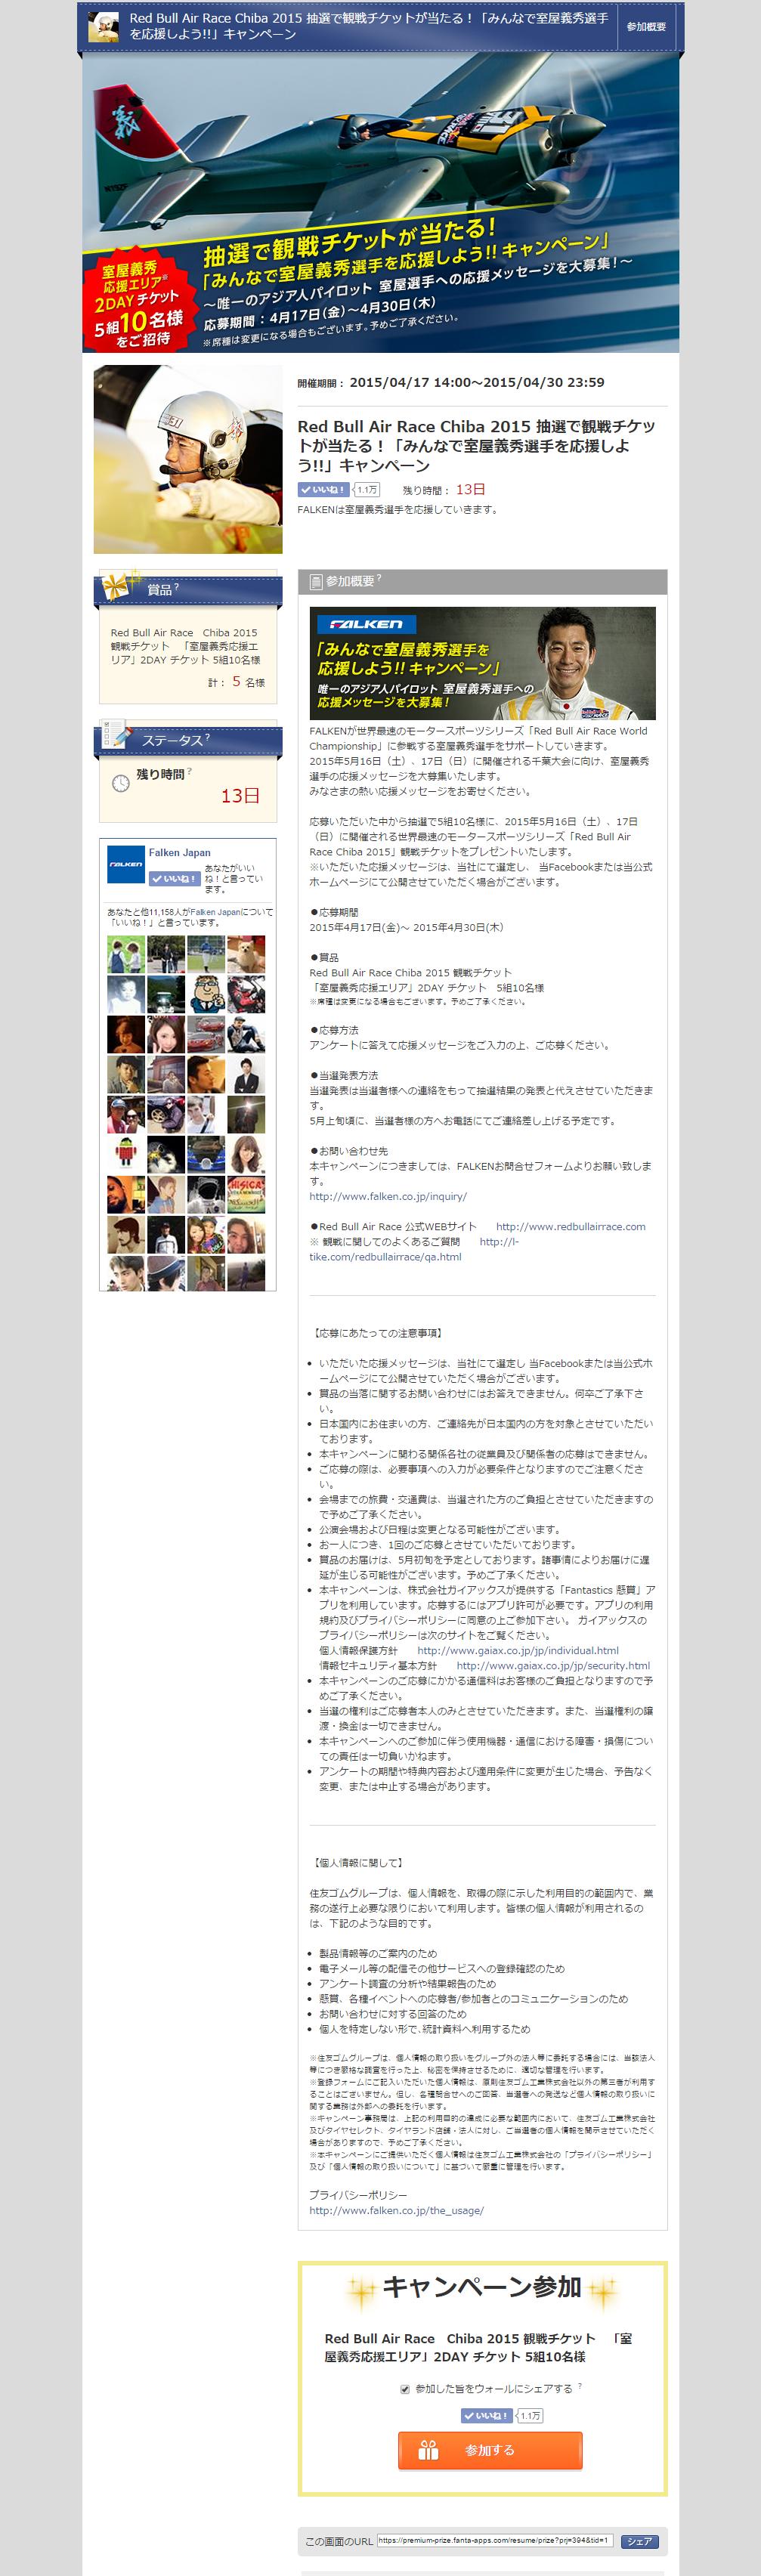 Fantastics「アンケート型」懸賞アプリ(住友ゴム工業株式会社様)